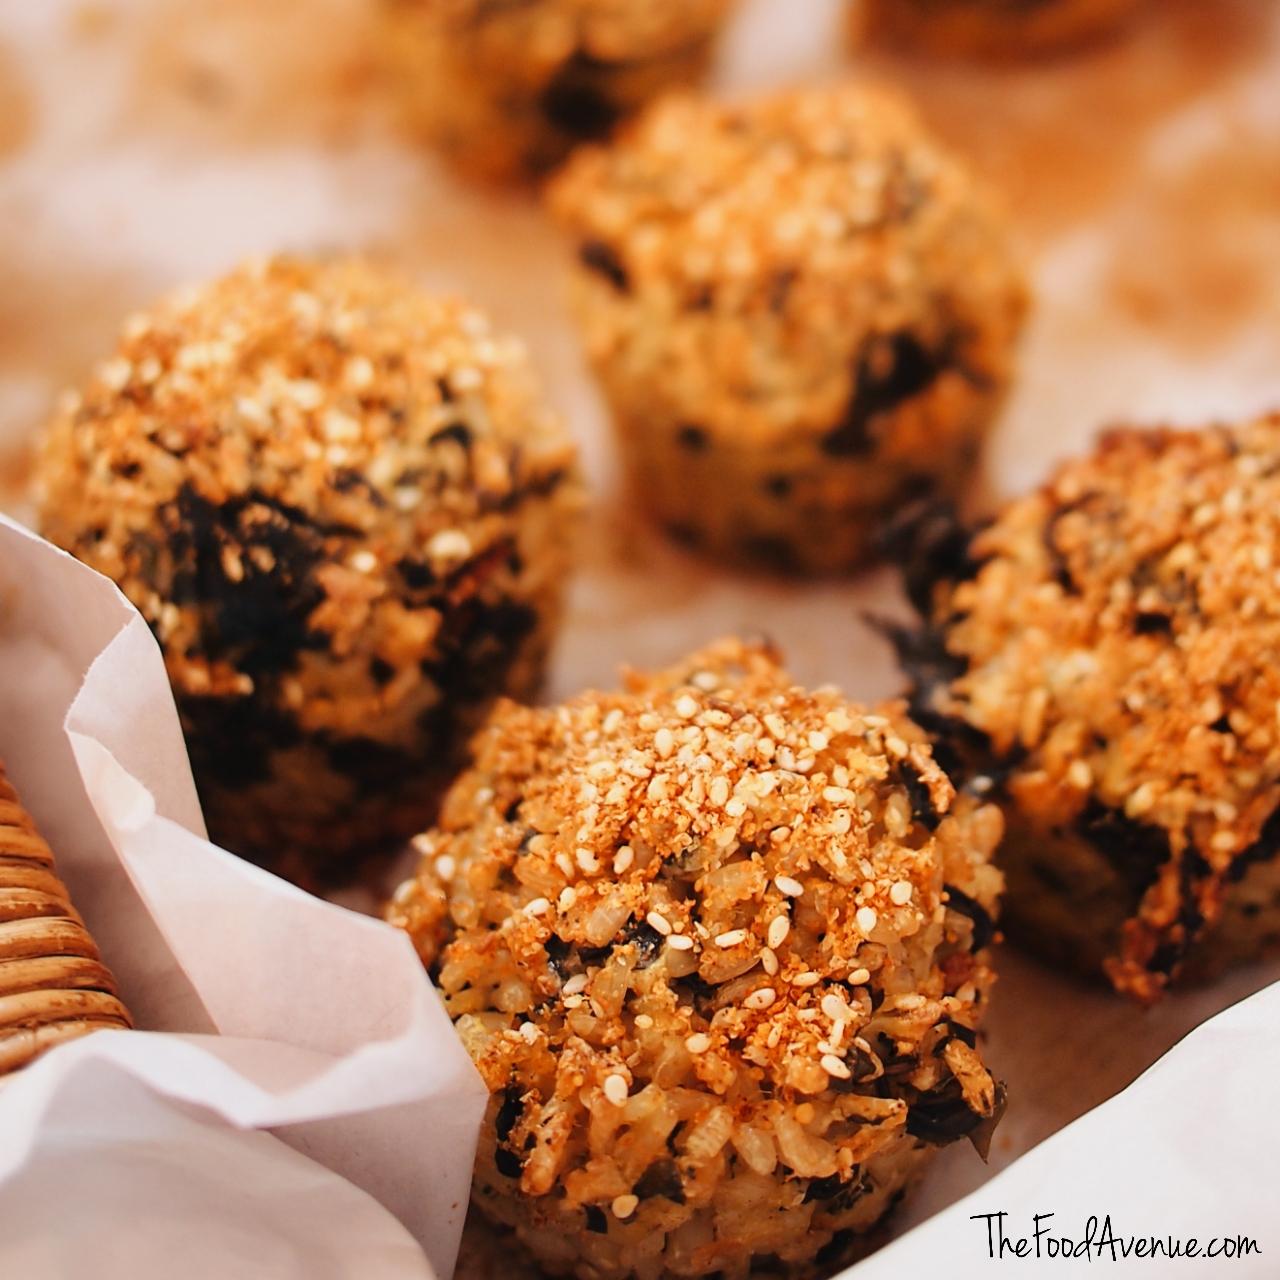 The_Food_Avenue_Tilba4